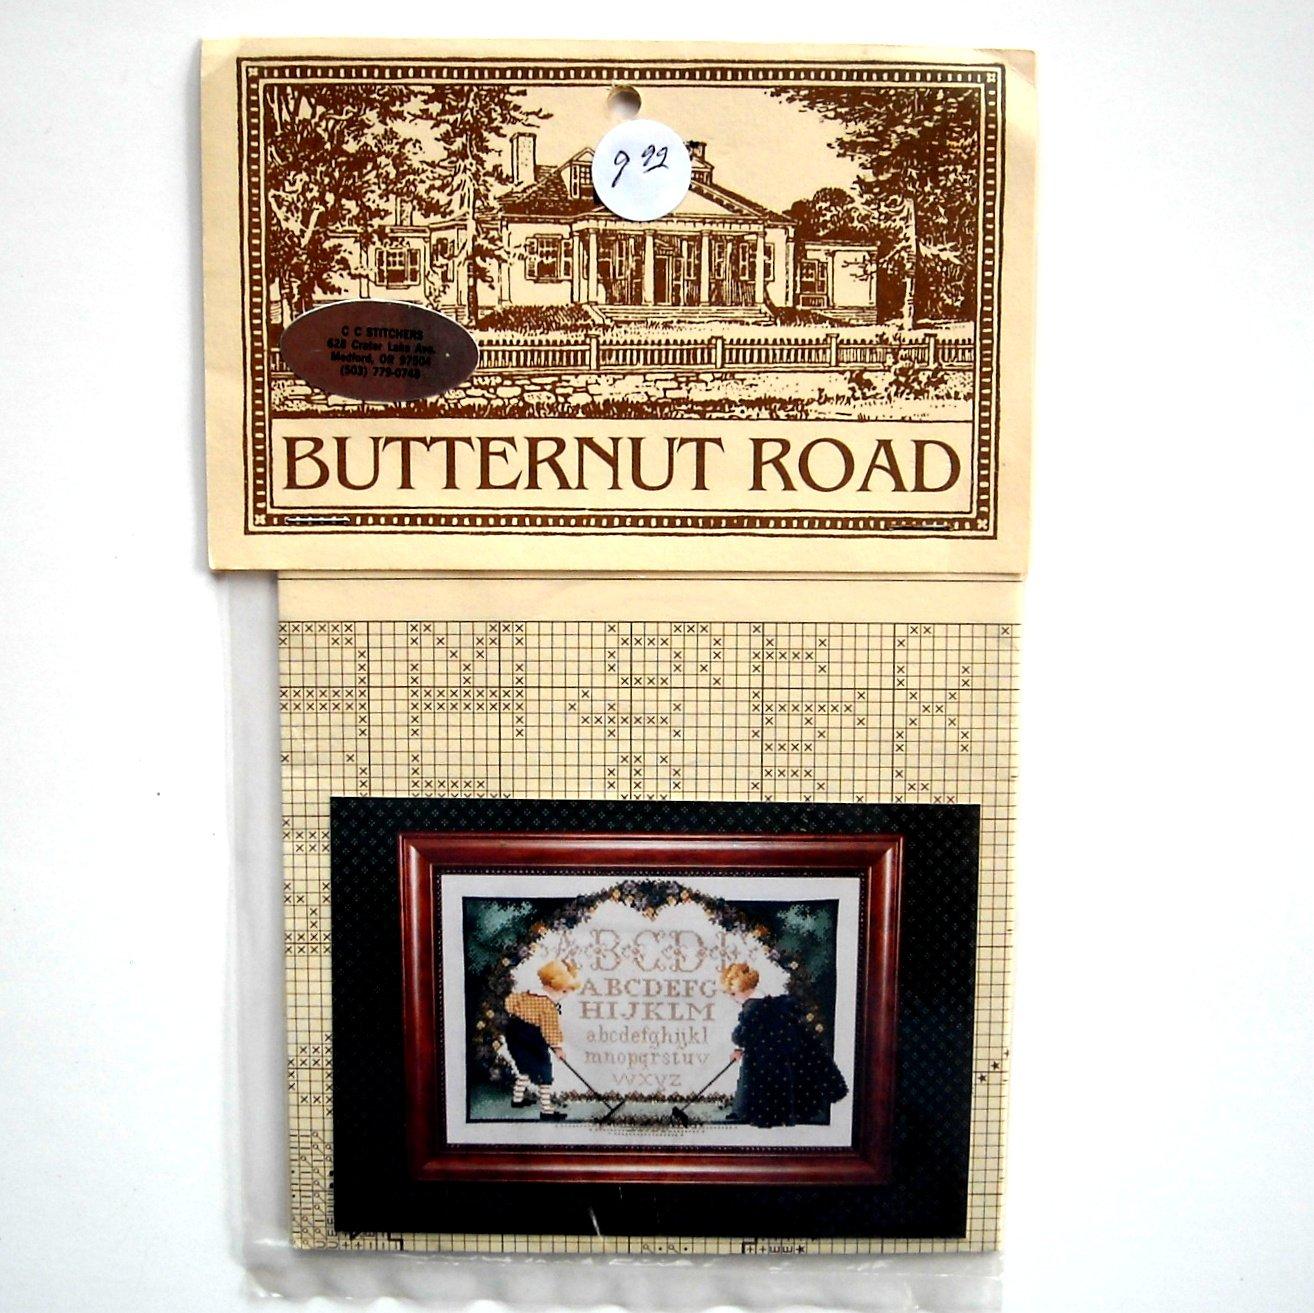 Butternut Road Childrens Garden Counted Cross Stitch Pattern